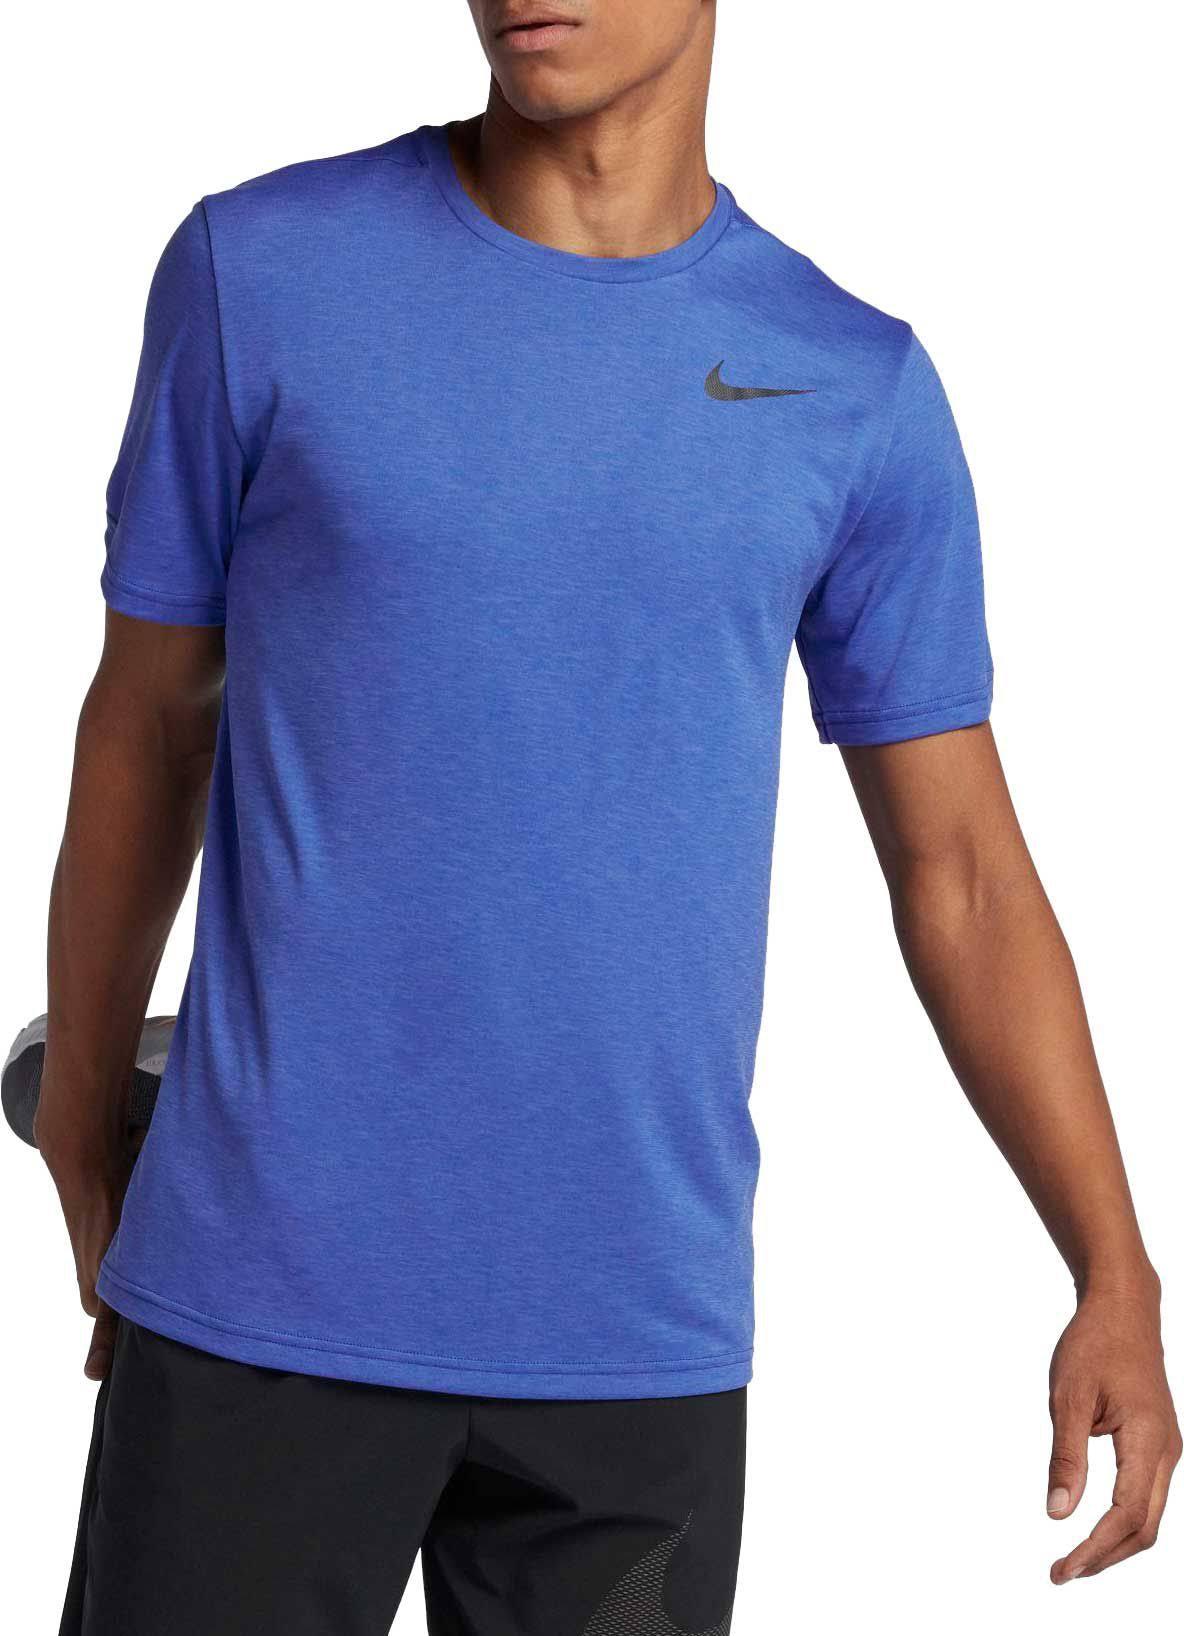 Hombre Para Entrenamiento Regular Camiseta Blue Breathe Hyper Nike Dry De Xl vY0wq05p